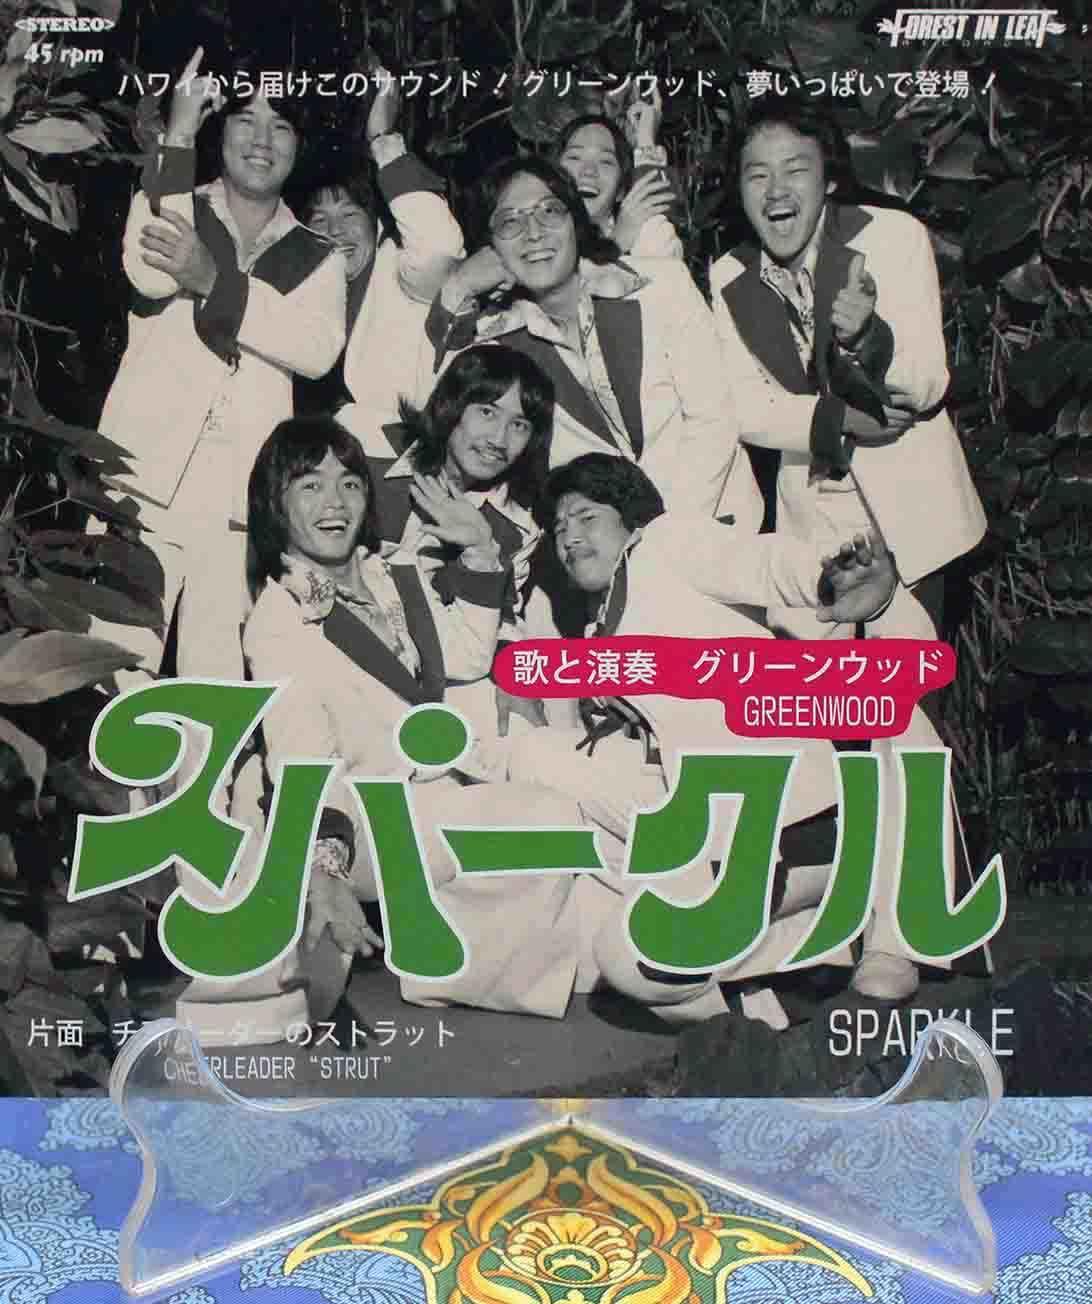 Greenwood Sparkle 日本盤 01